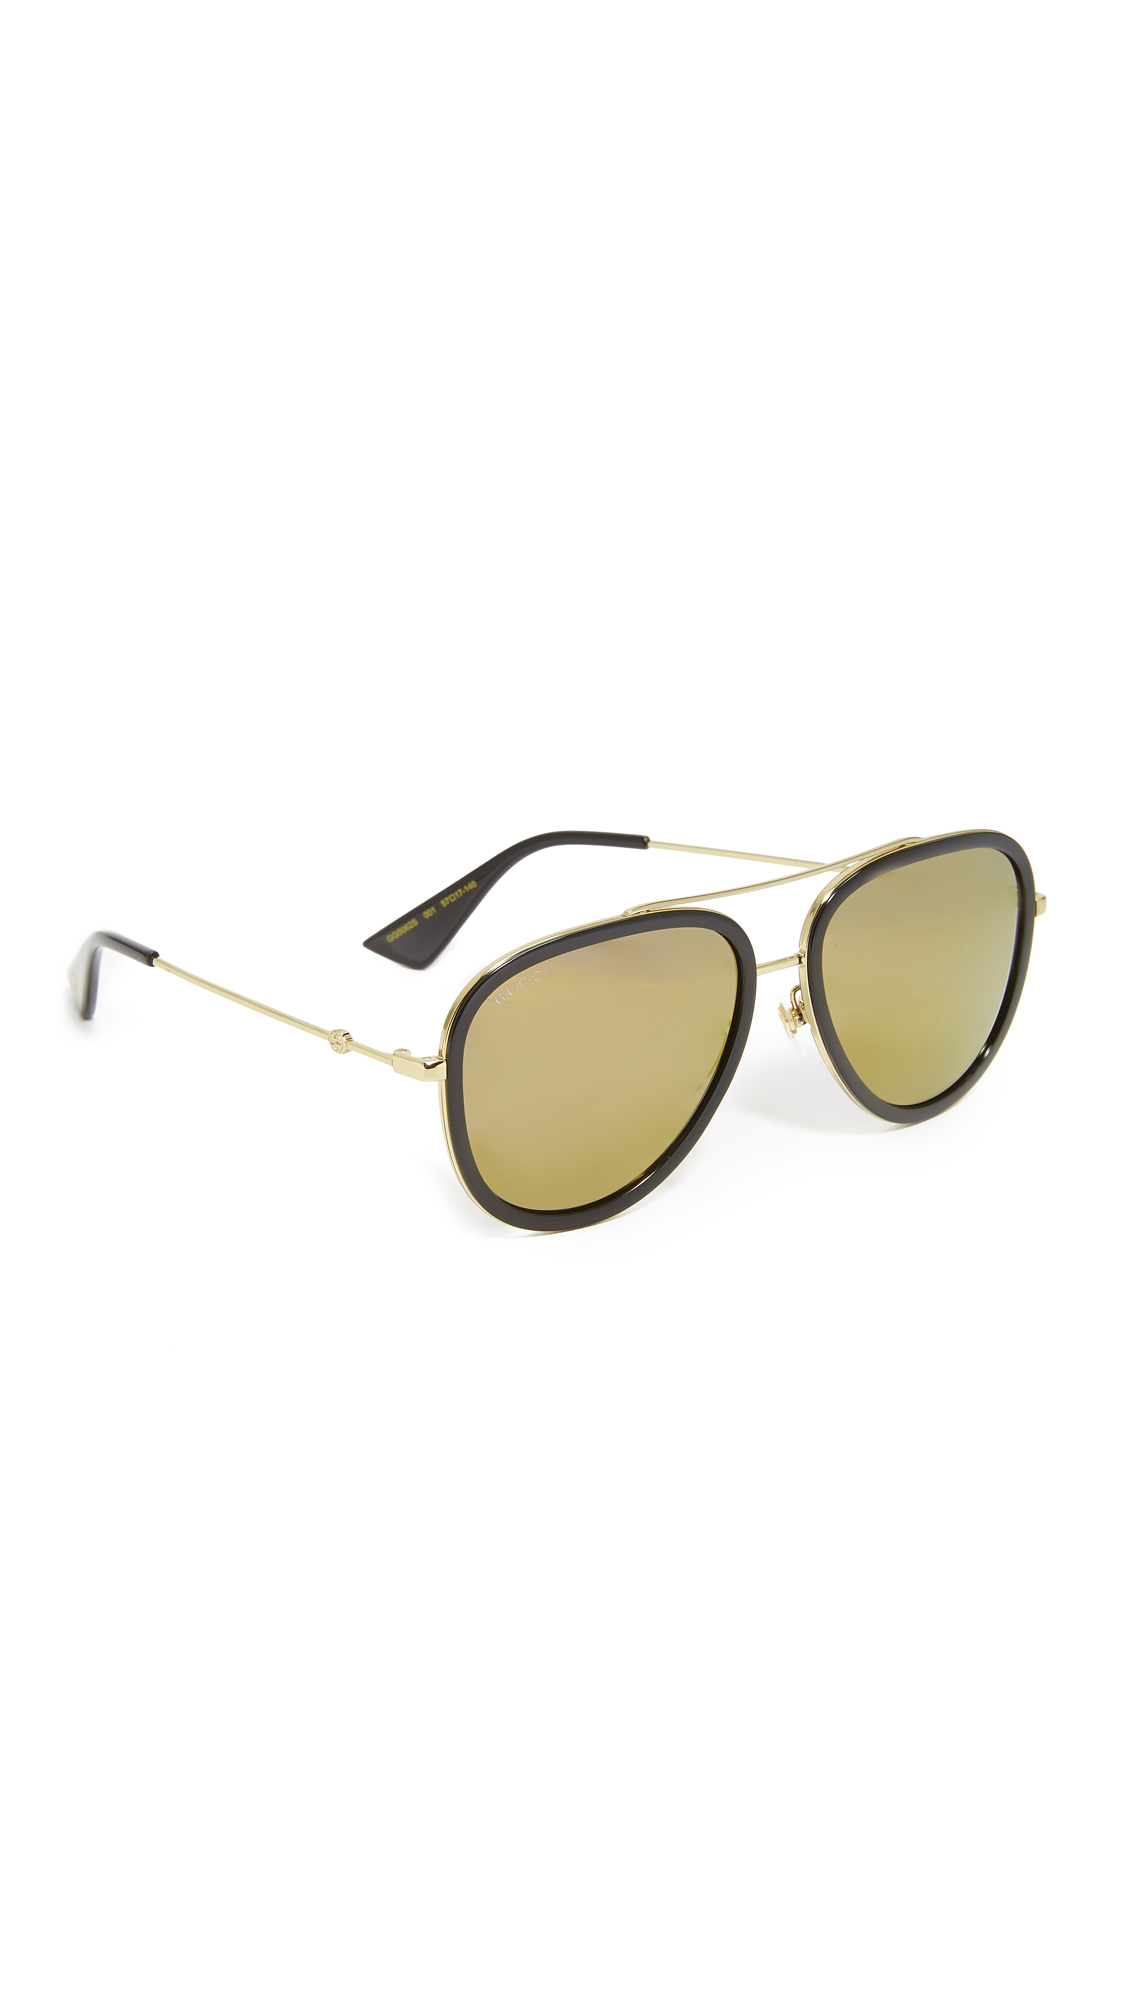 Gucci Flash Pilot Urban Web Block Aviator Sunglasses - Gold/Gold at Shopbop